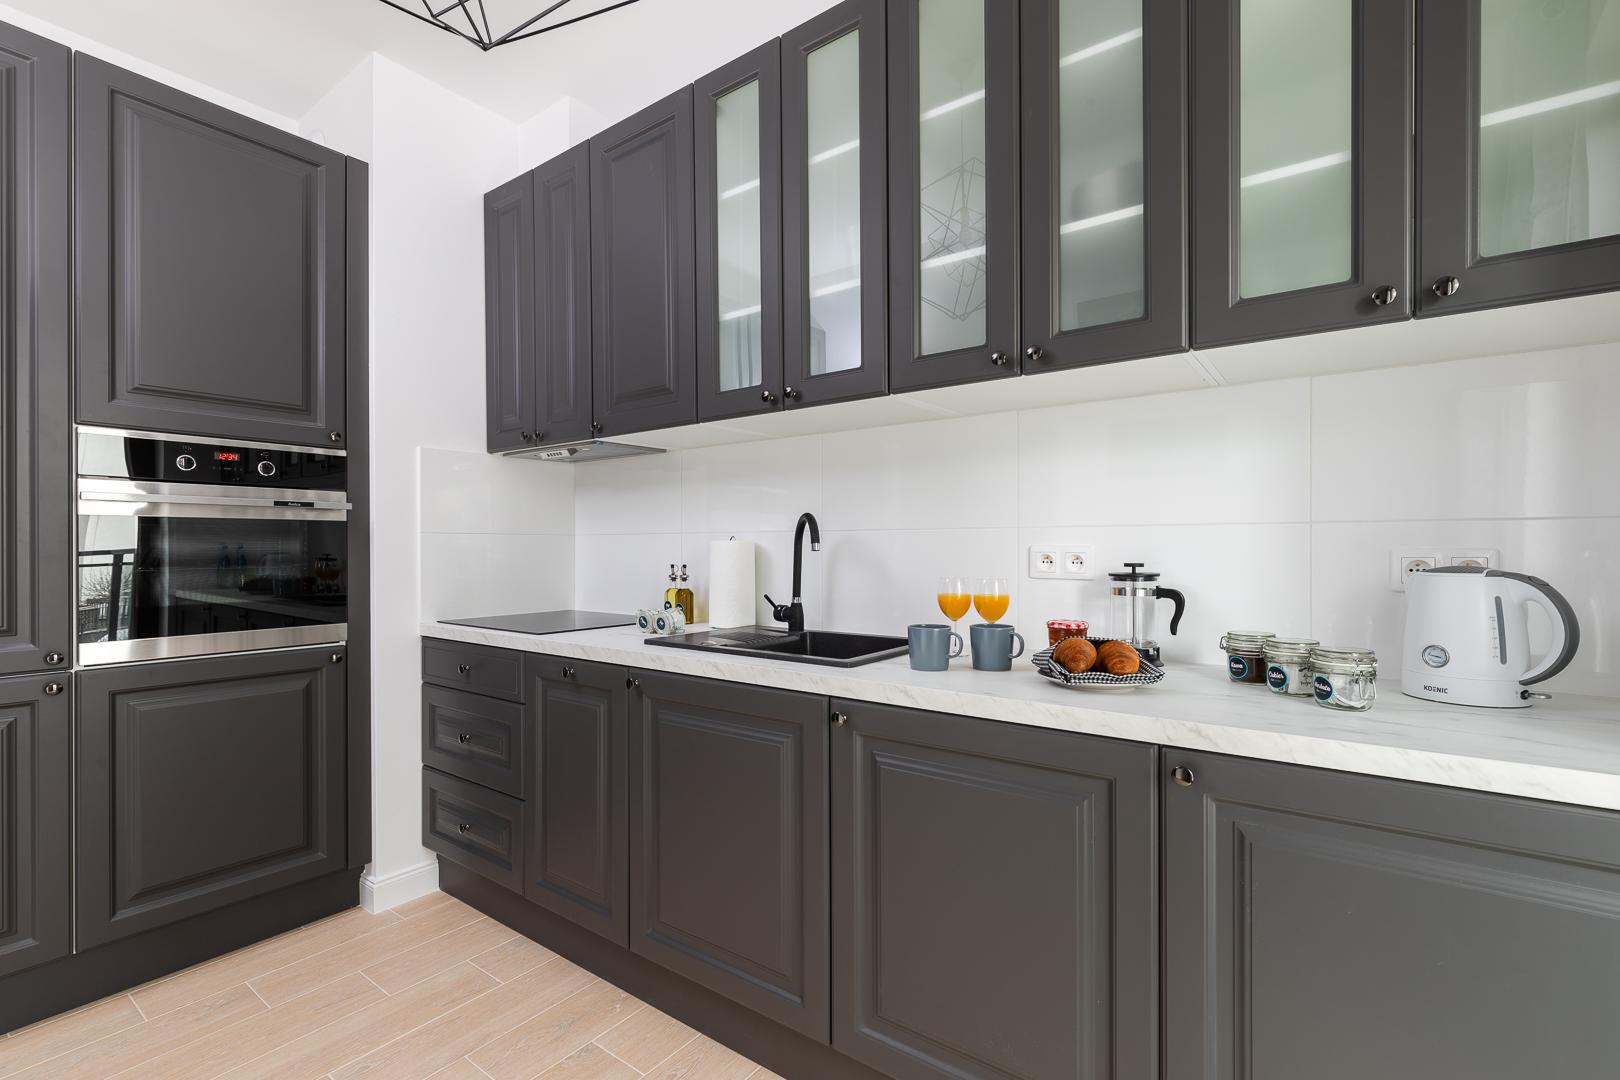 Kitchen at Burakowska Apartments